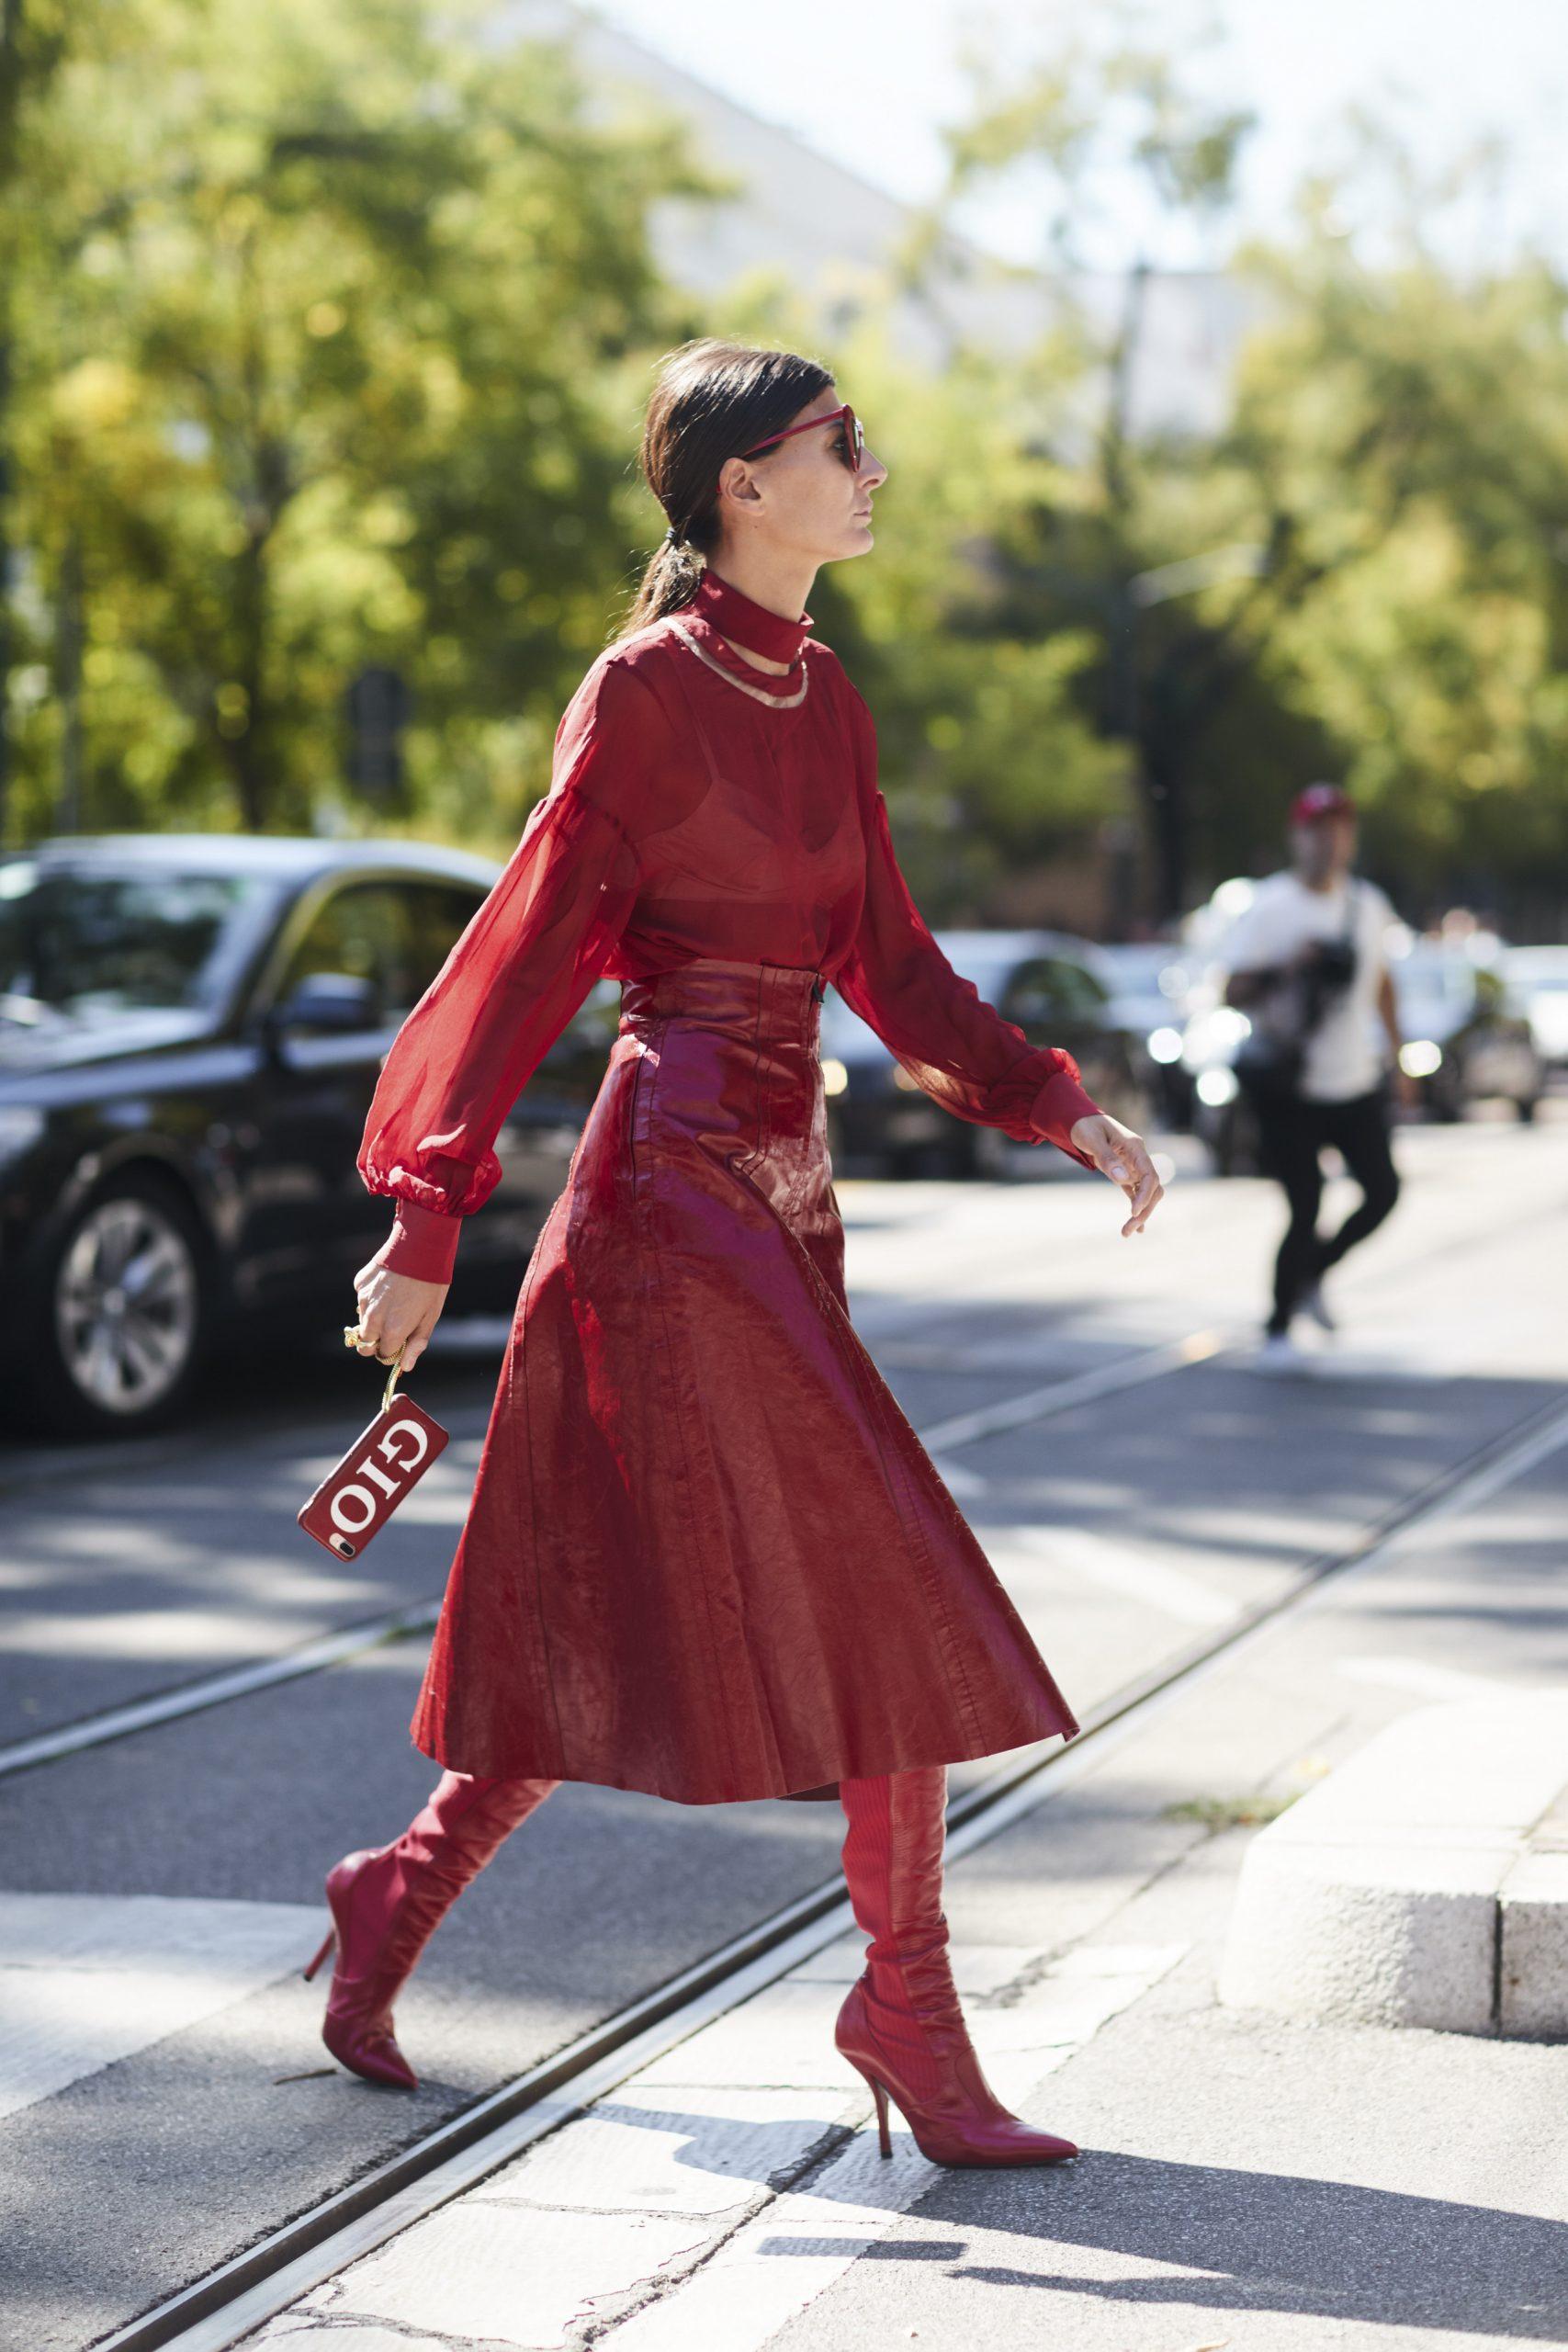 La editora de moda Giovanna Battaglia/Imaxtree.